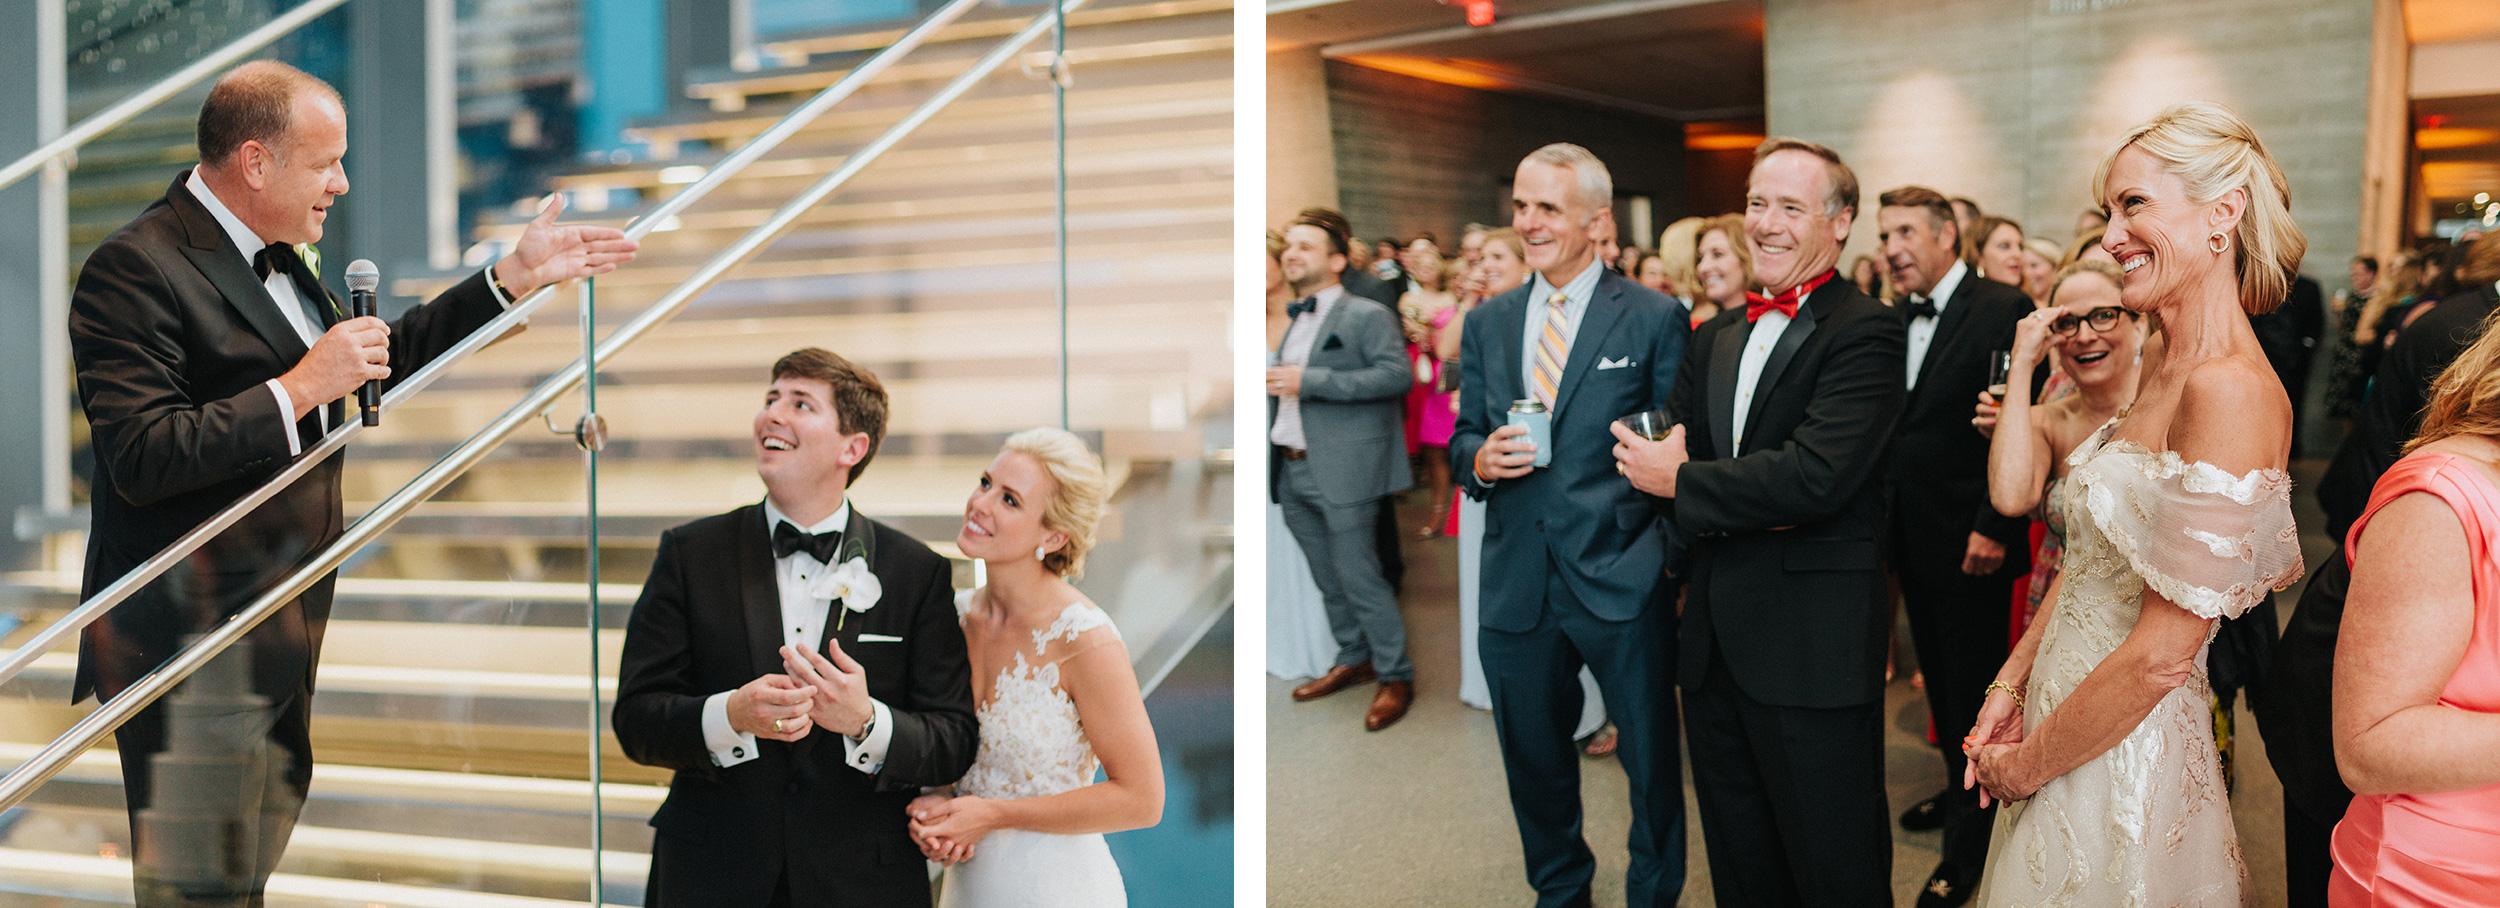 speed-art-museum-wedding-photographer-26.JPG